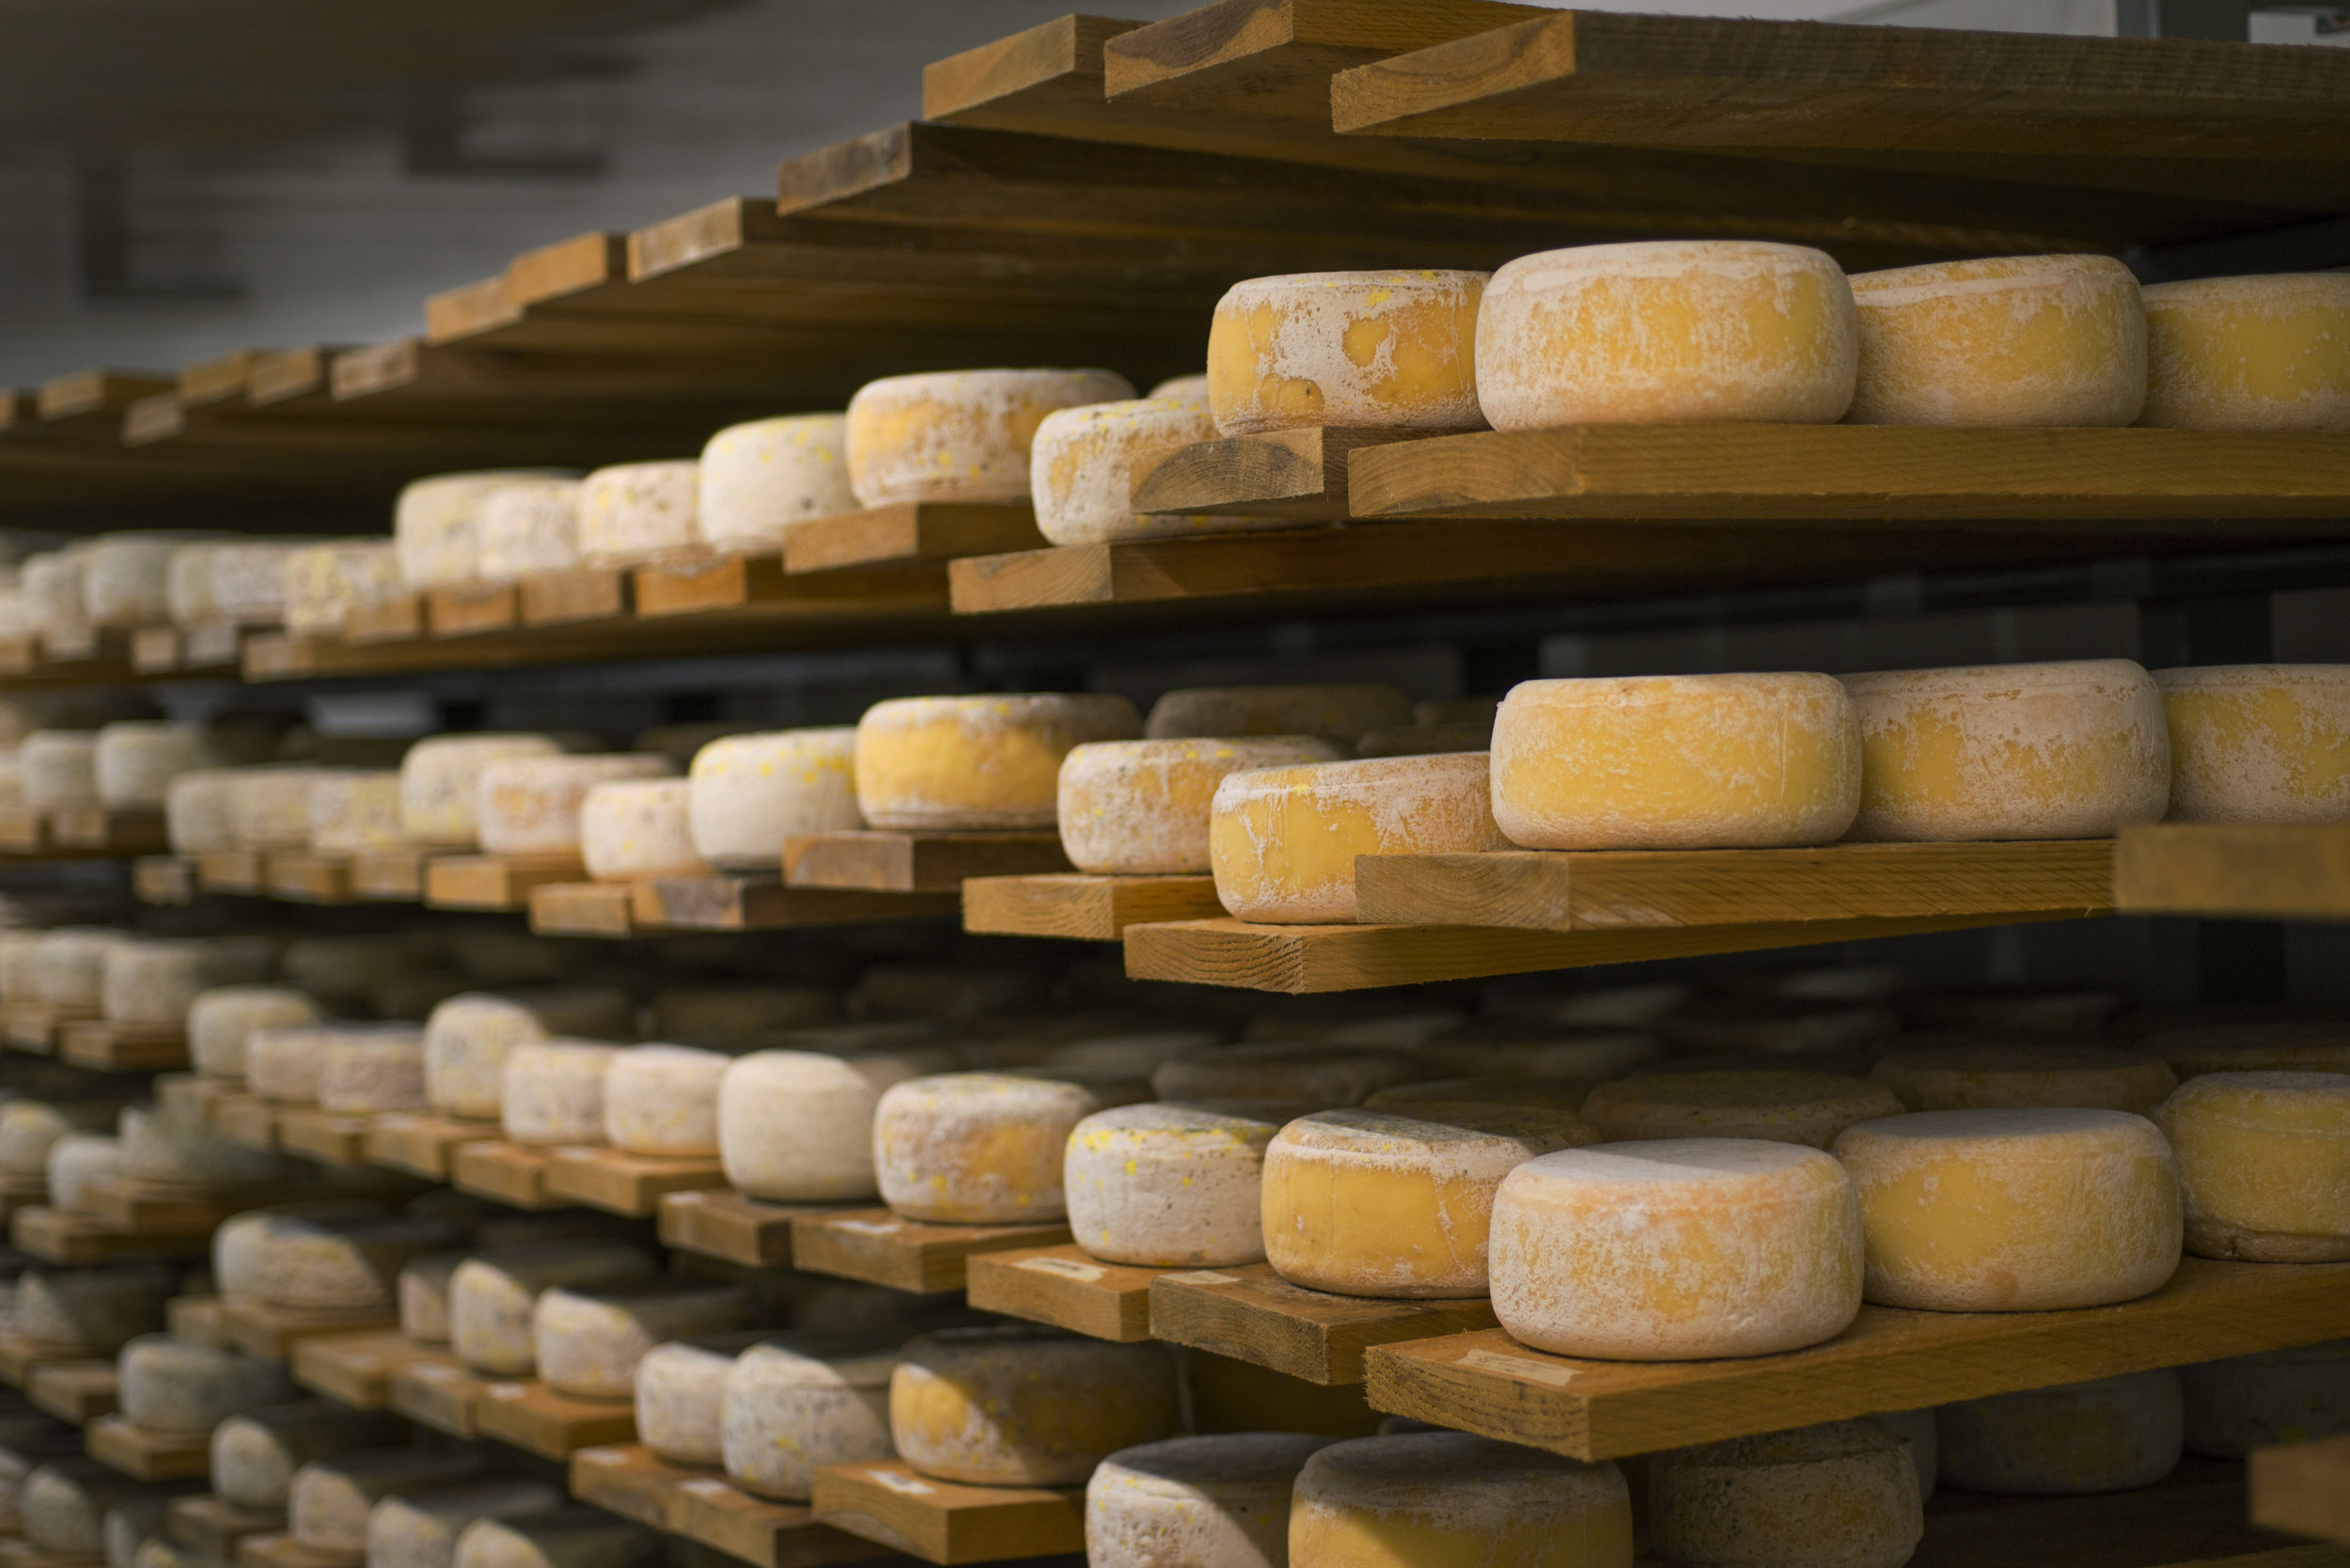 cheese_cave_2_TOM5229.jpg